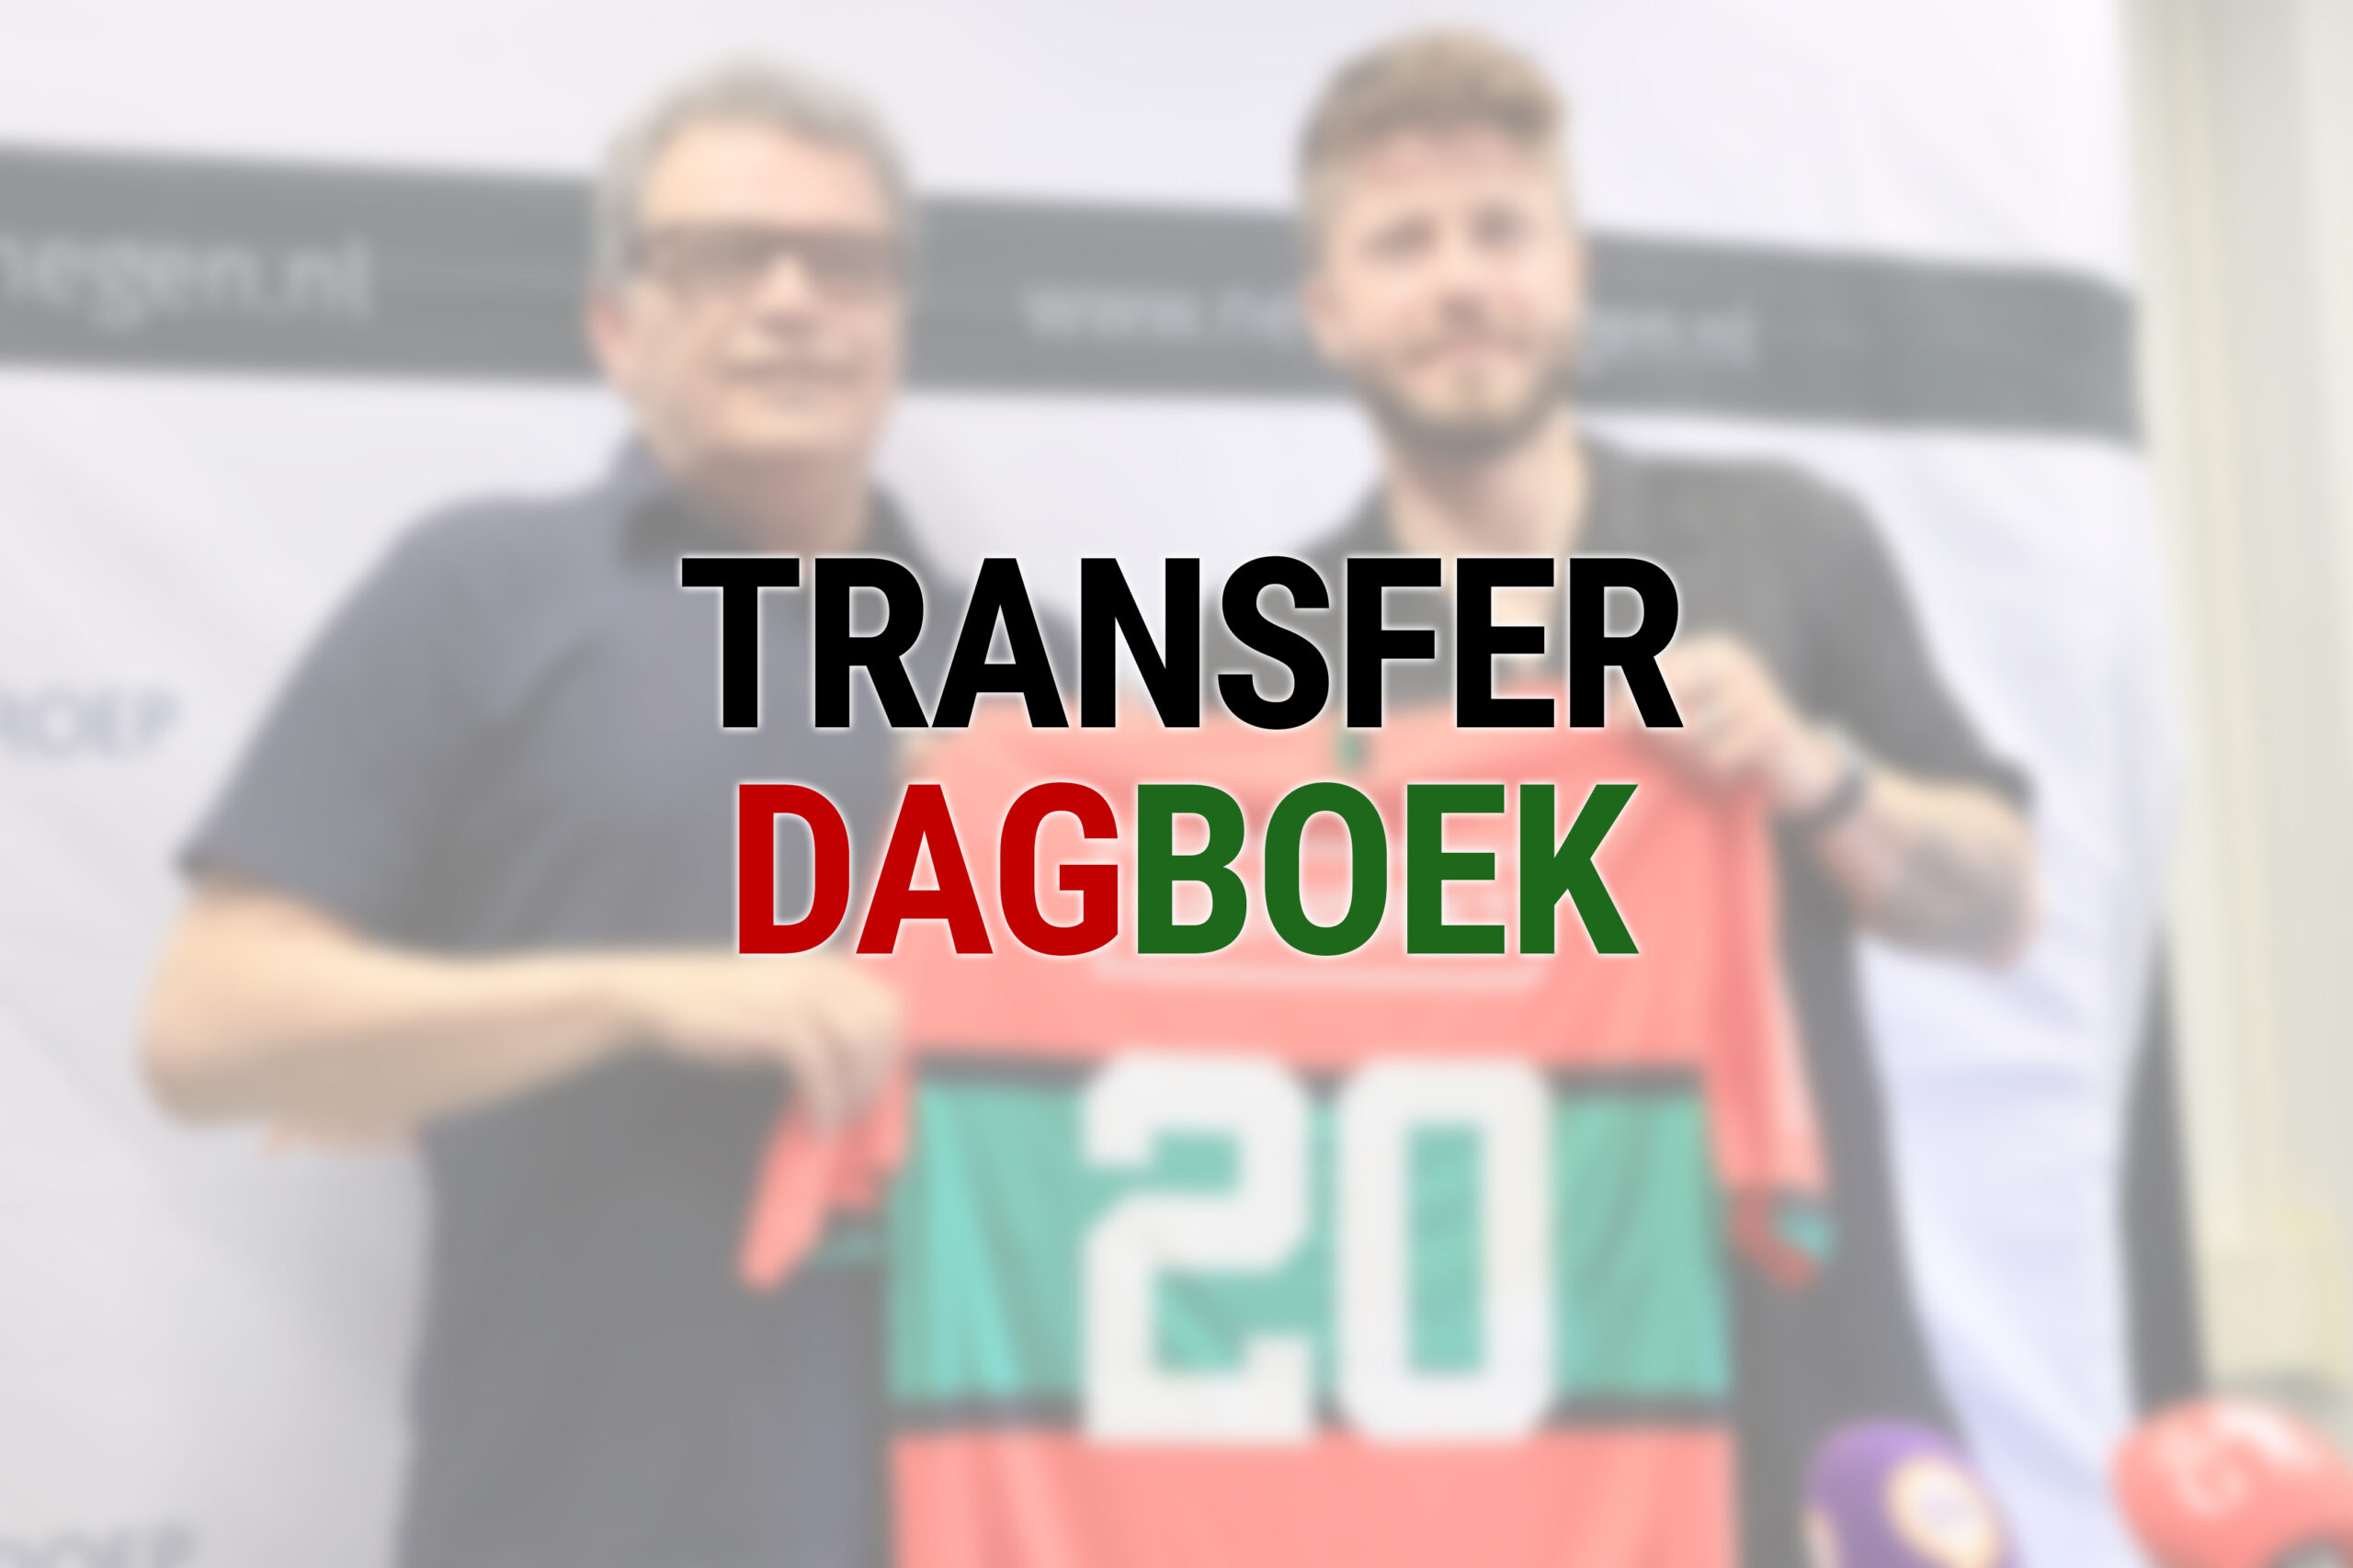 Transferdagboek 13/6: Ook NEC geïnteresseerd in Twente-doelwit Ugalde